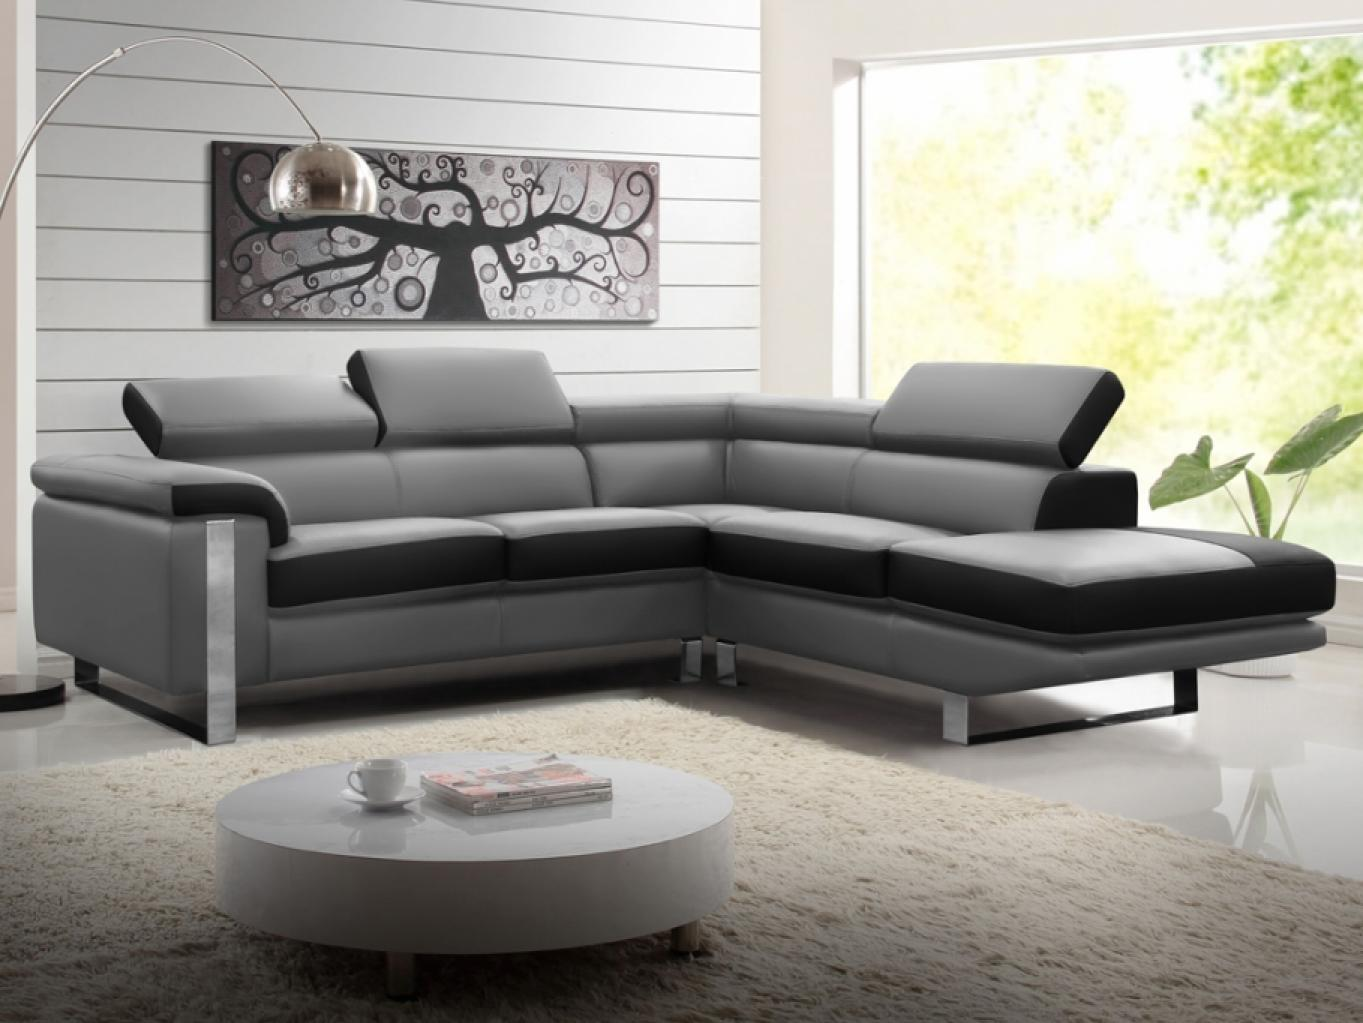 photos canap d 39 angle cuir gris conforama. Black Bedroom Furniture Sets. Home Design Ideas